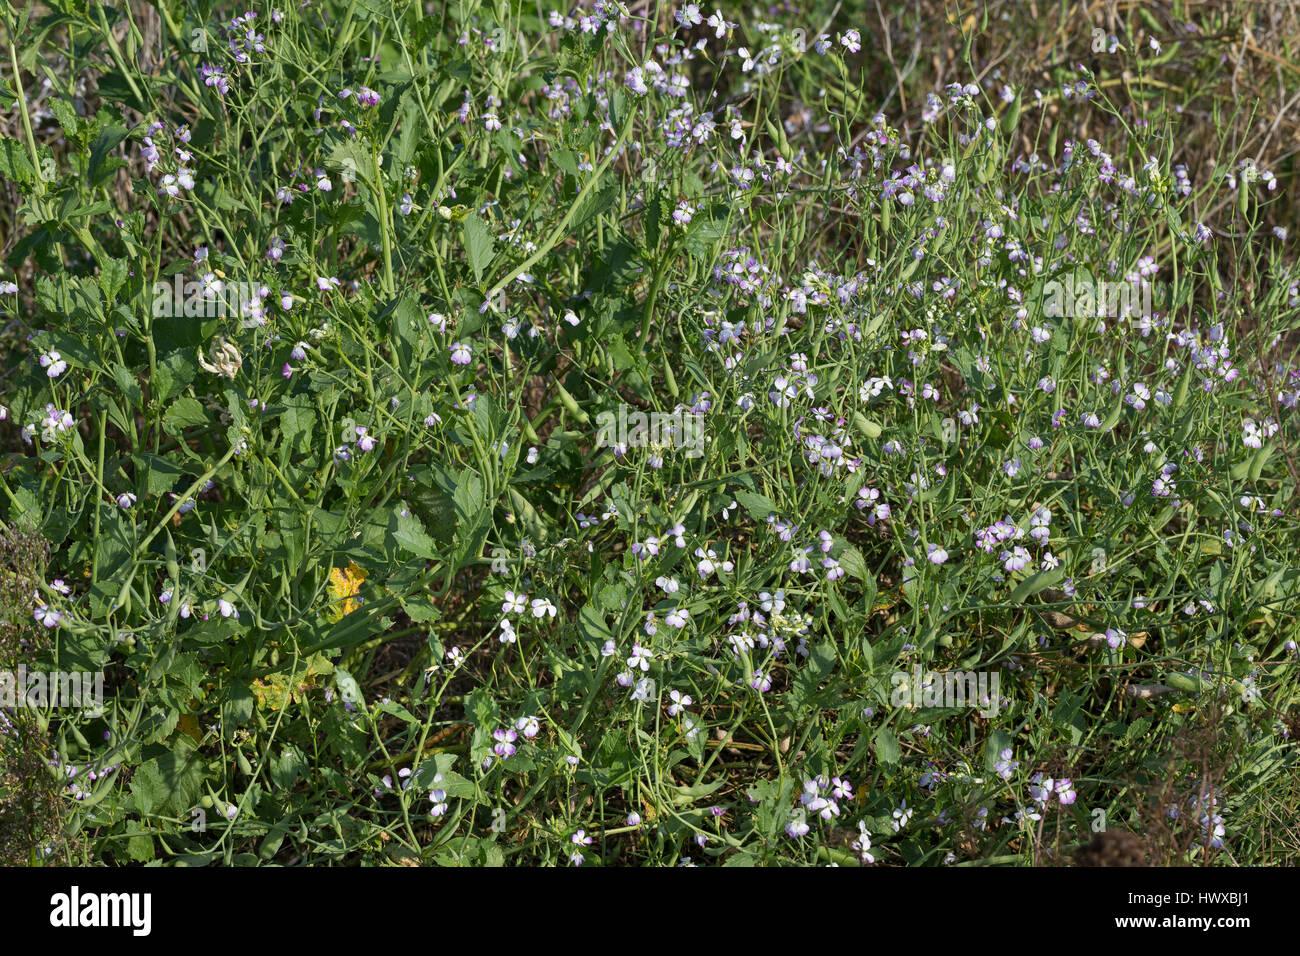 Garten-Rettich, Gartenrettich, Rettich, Raphanus sativus, radish, Le radis Stock Photo